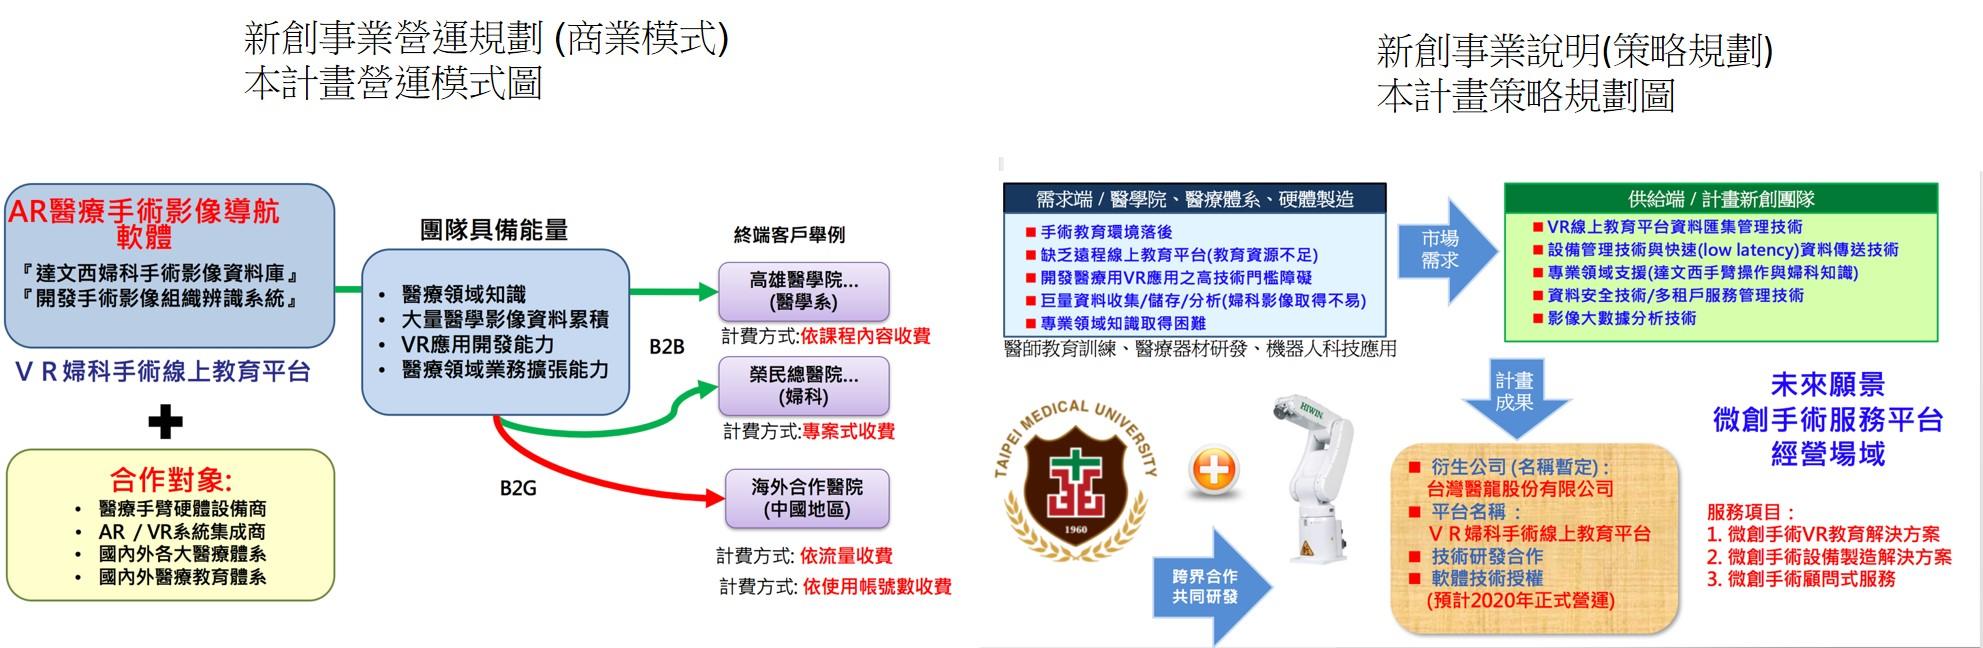 Da Vinci Surgery Medical AR NavigationVR Education Platform:  A model in Gynecology